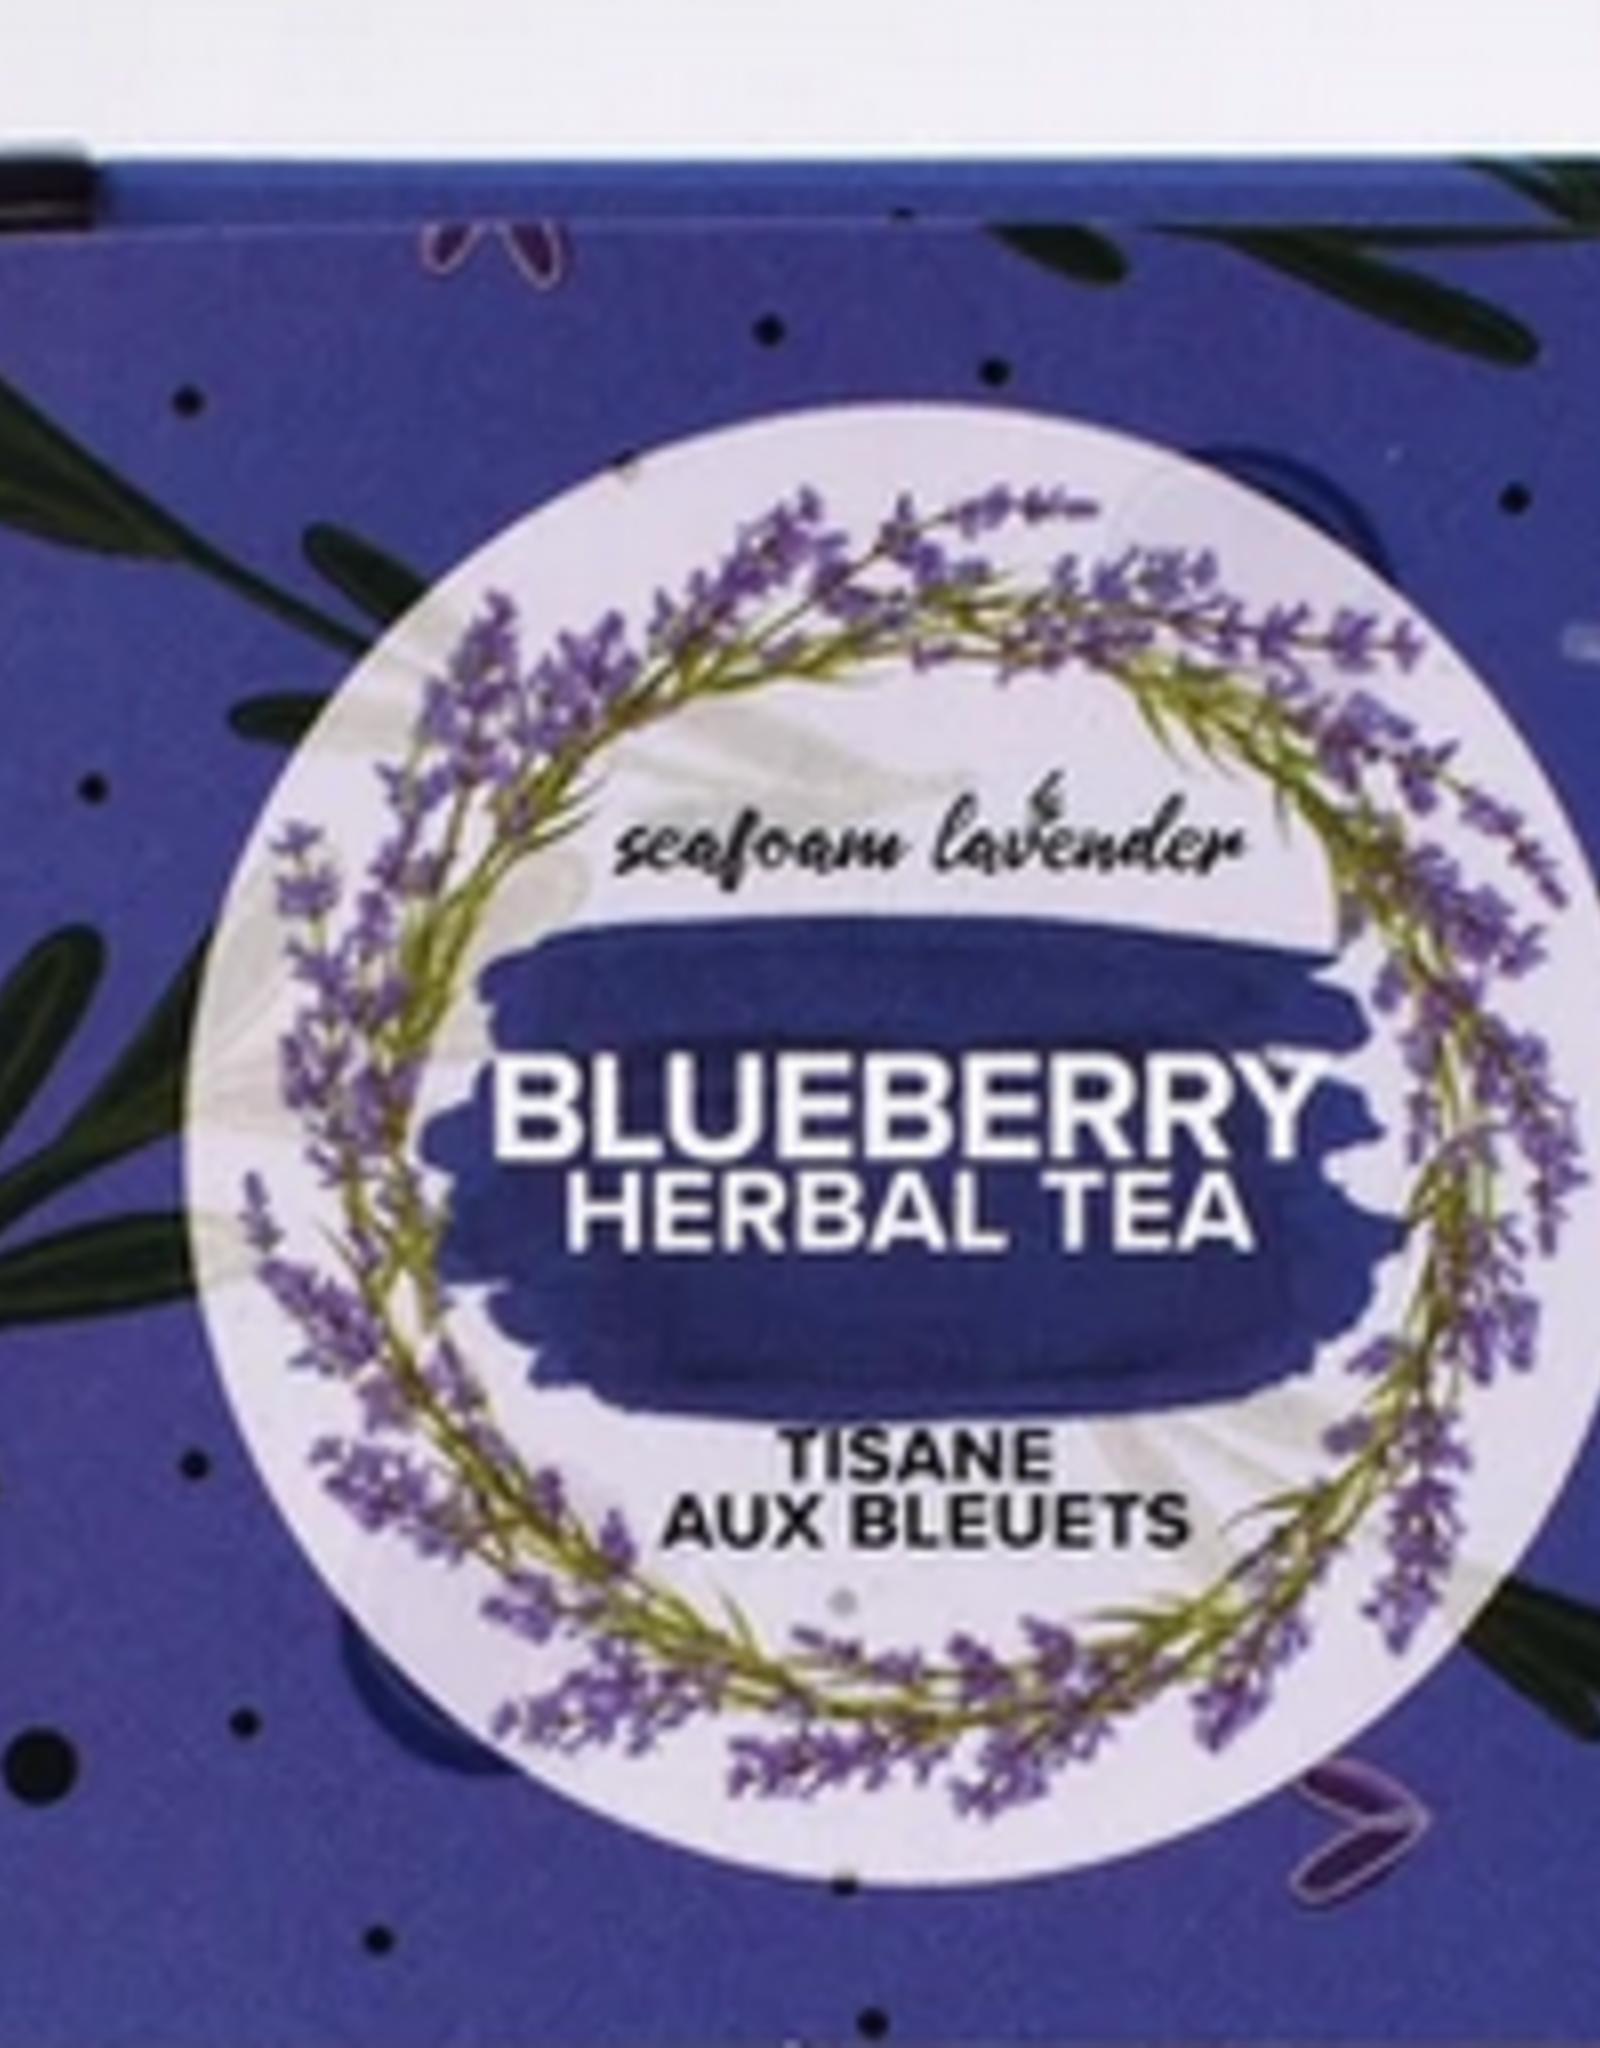 Seafoam & Lavender Blueberry Loose Leaf Tea  25 grams